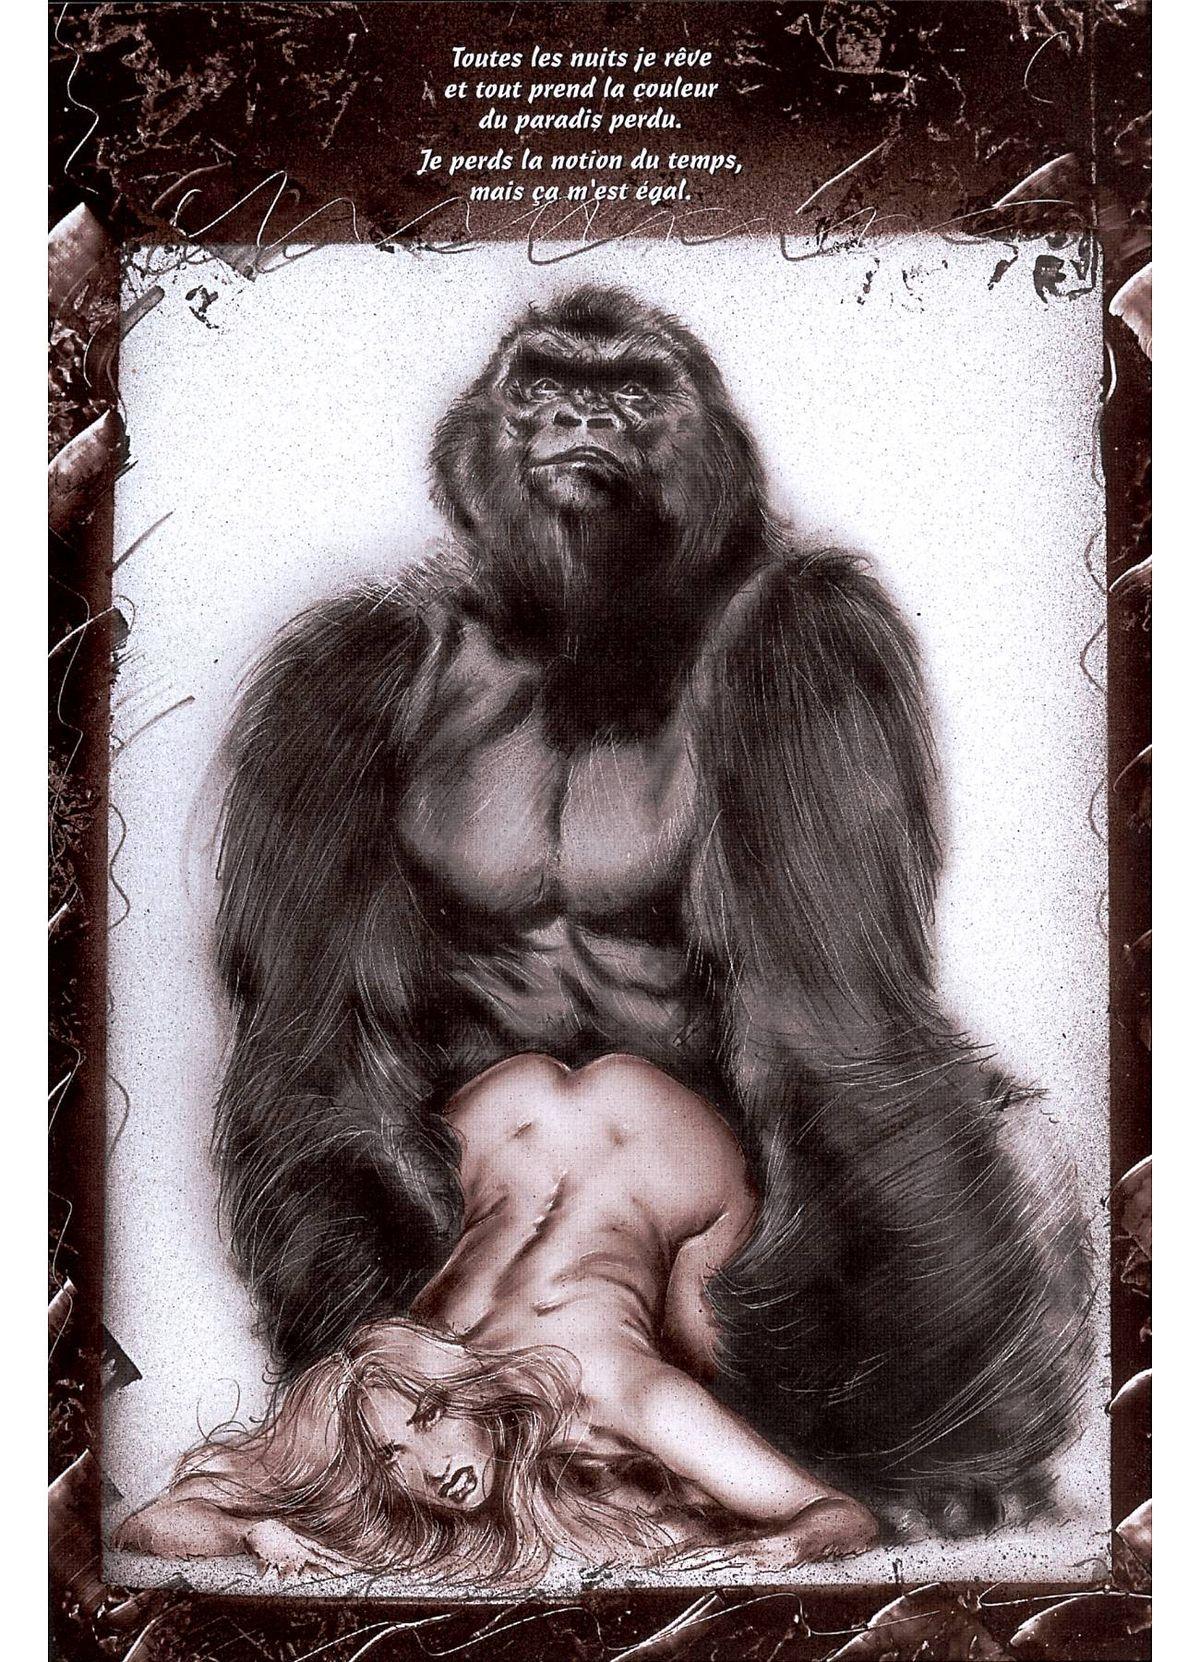 gorillas with sexy girls